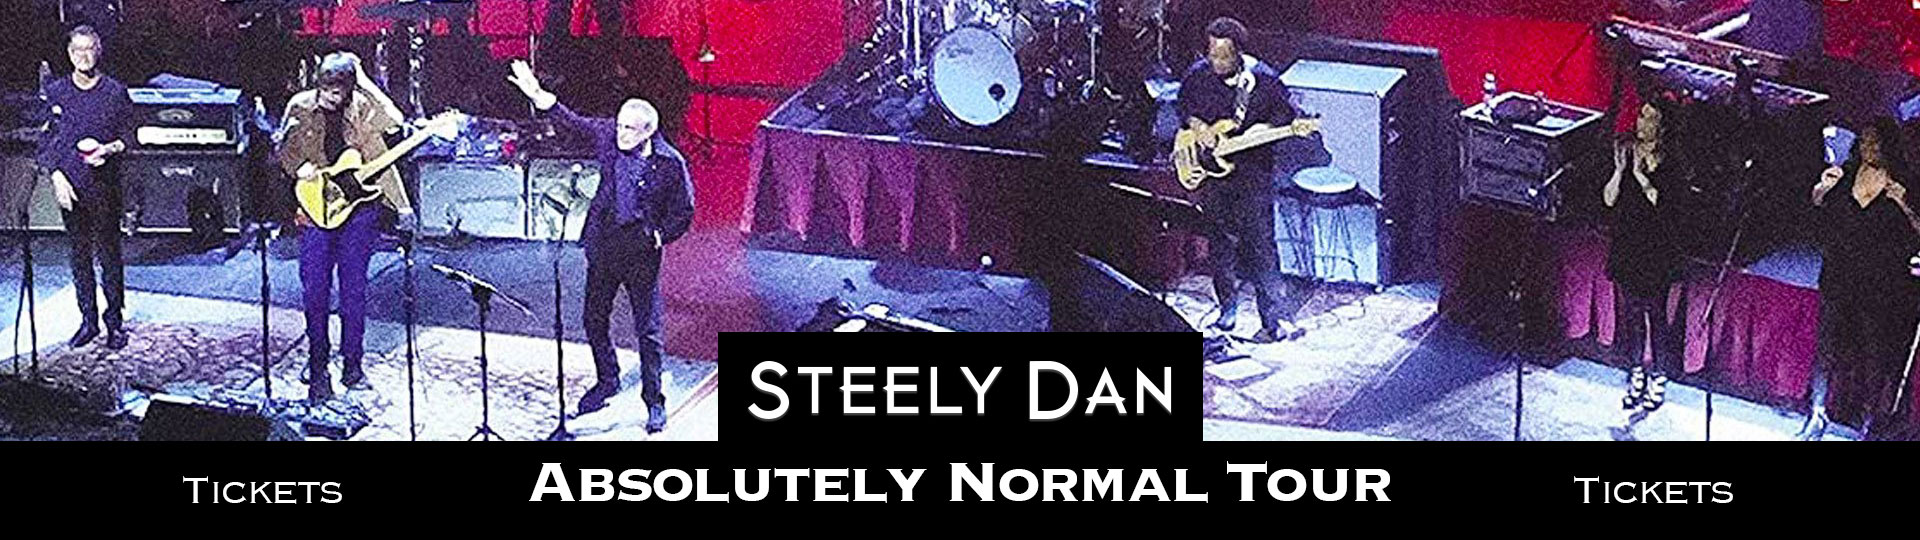 Ad for Steely Dan live album